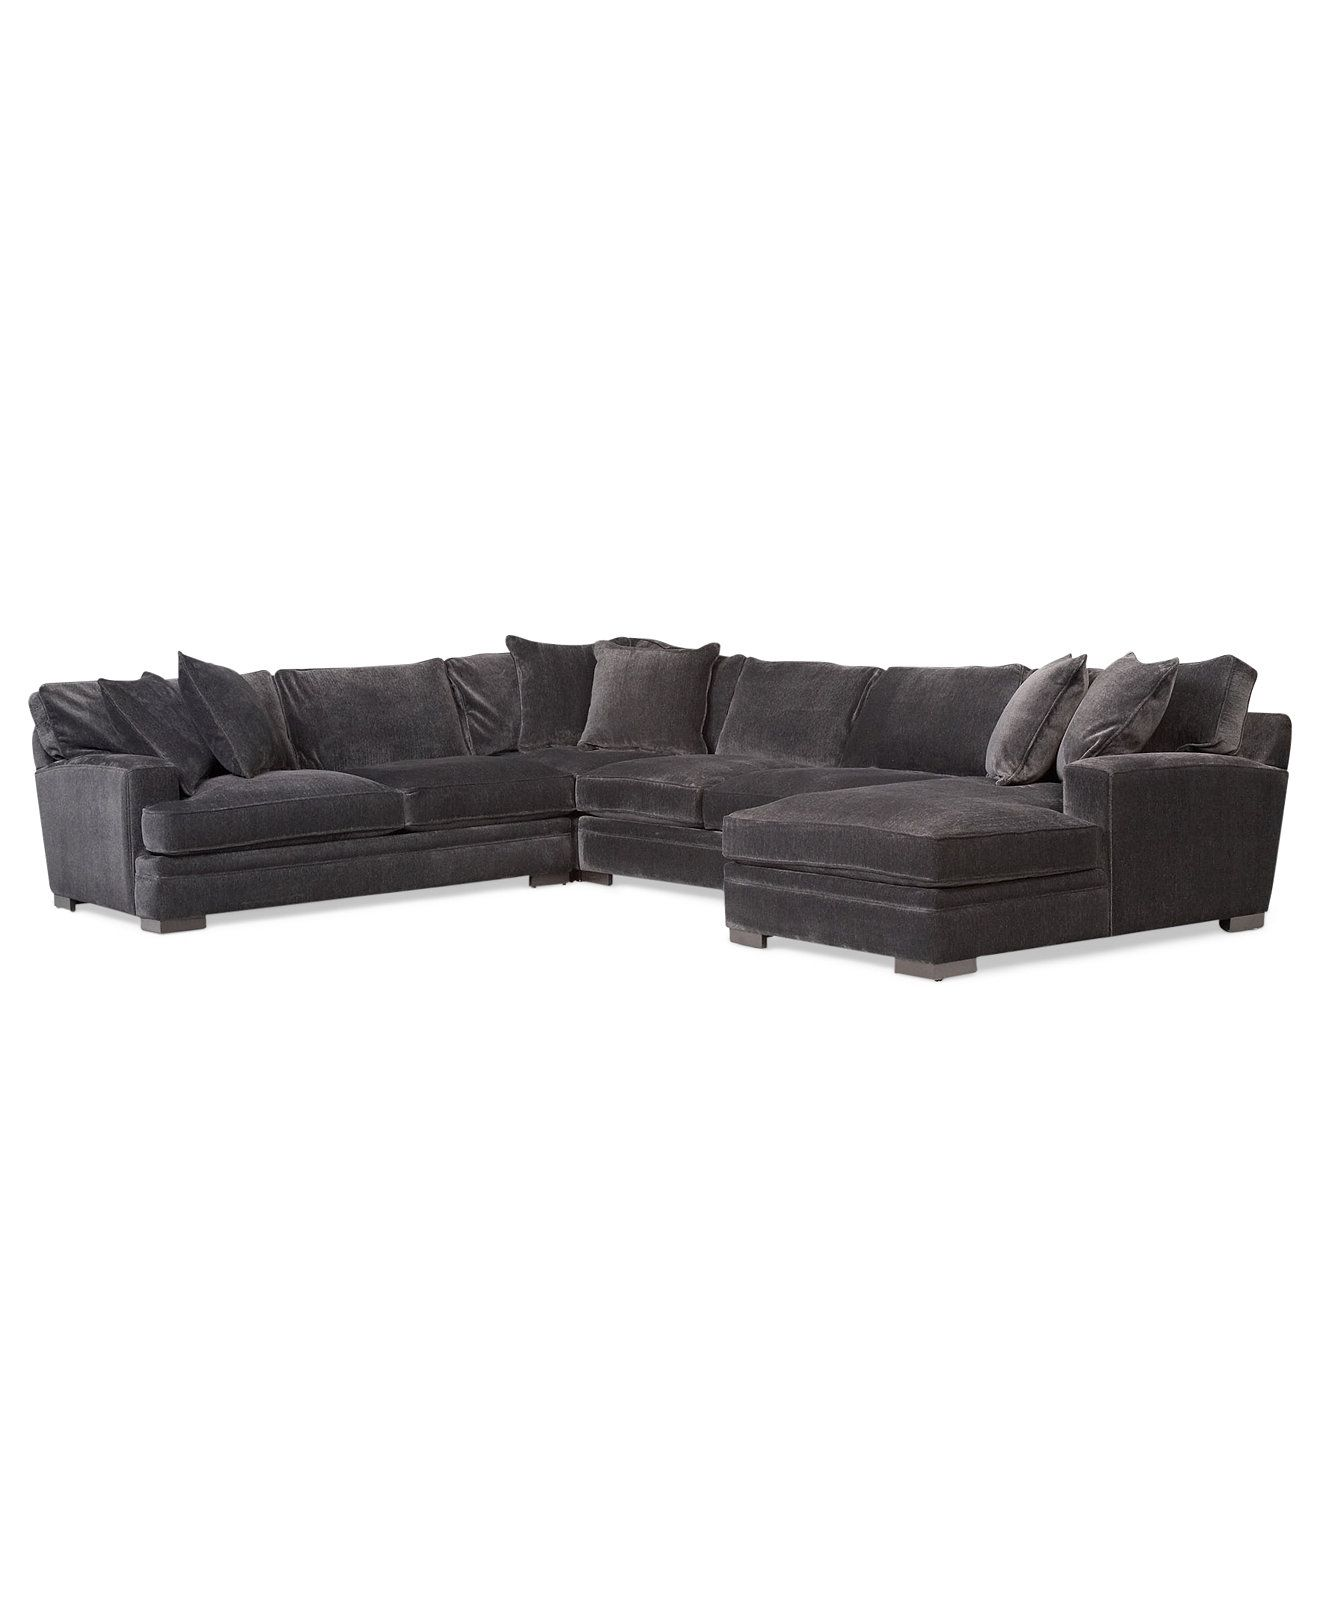 macys sectional sofa microfiber studio crows nest sydney teddy fabric 4 piece chaise couches